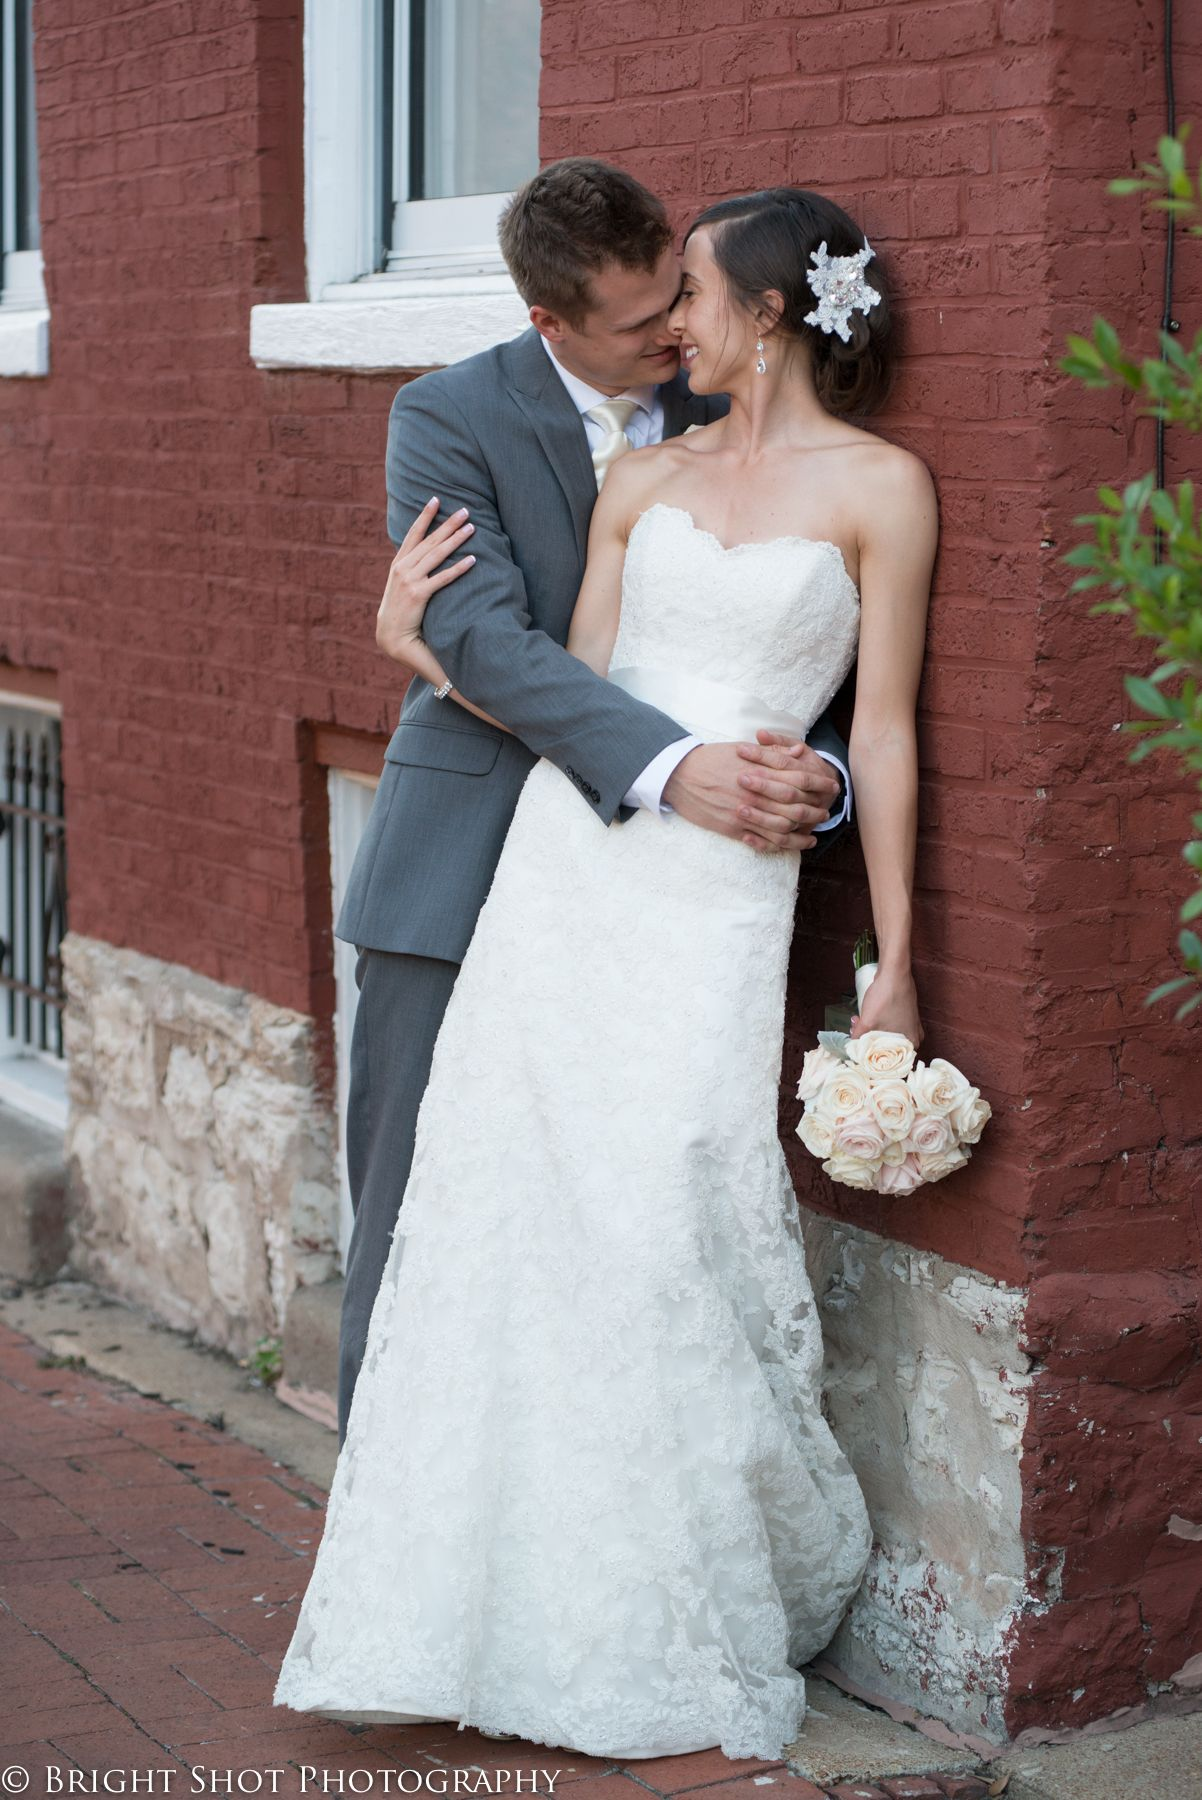 Wedding Moments // Wedding Photography // Destination Wedding Photographer // Follow @Bright_Shot (twitter)